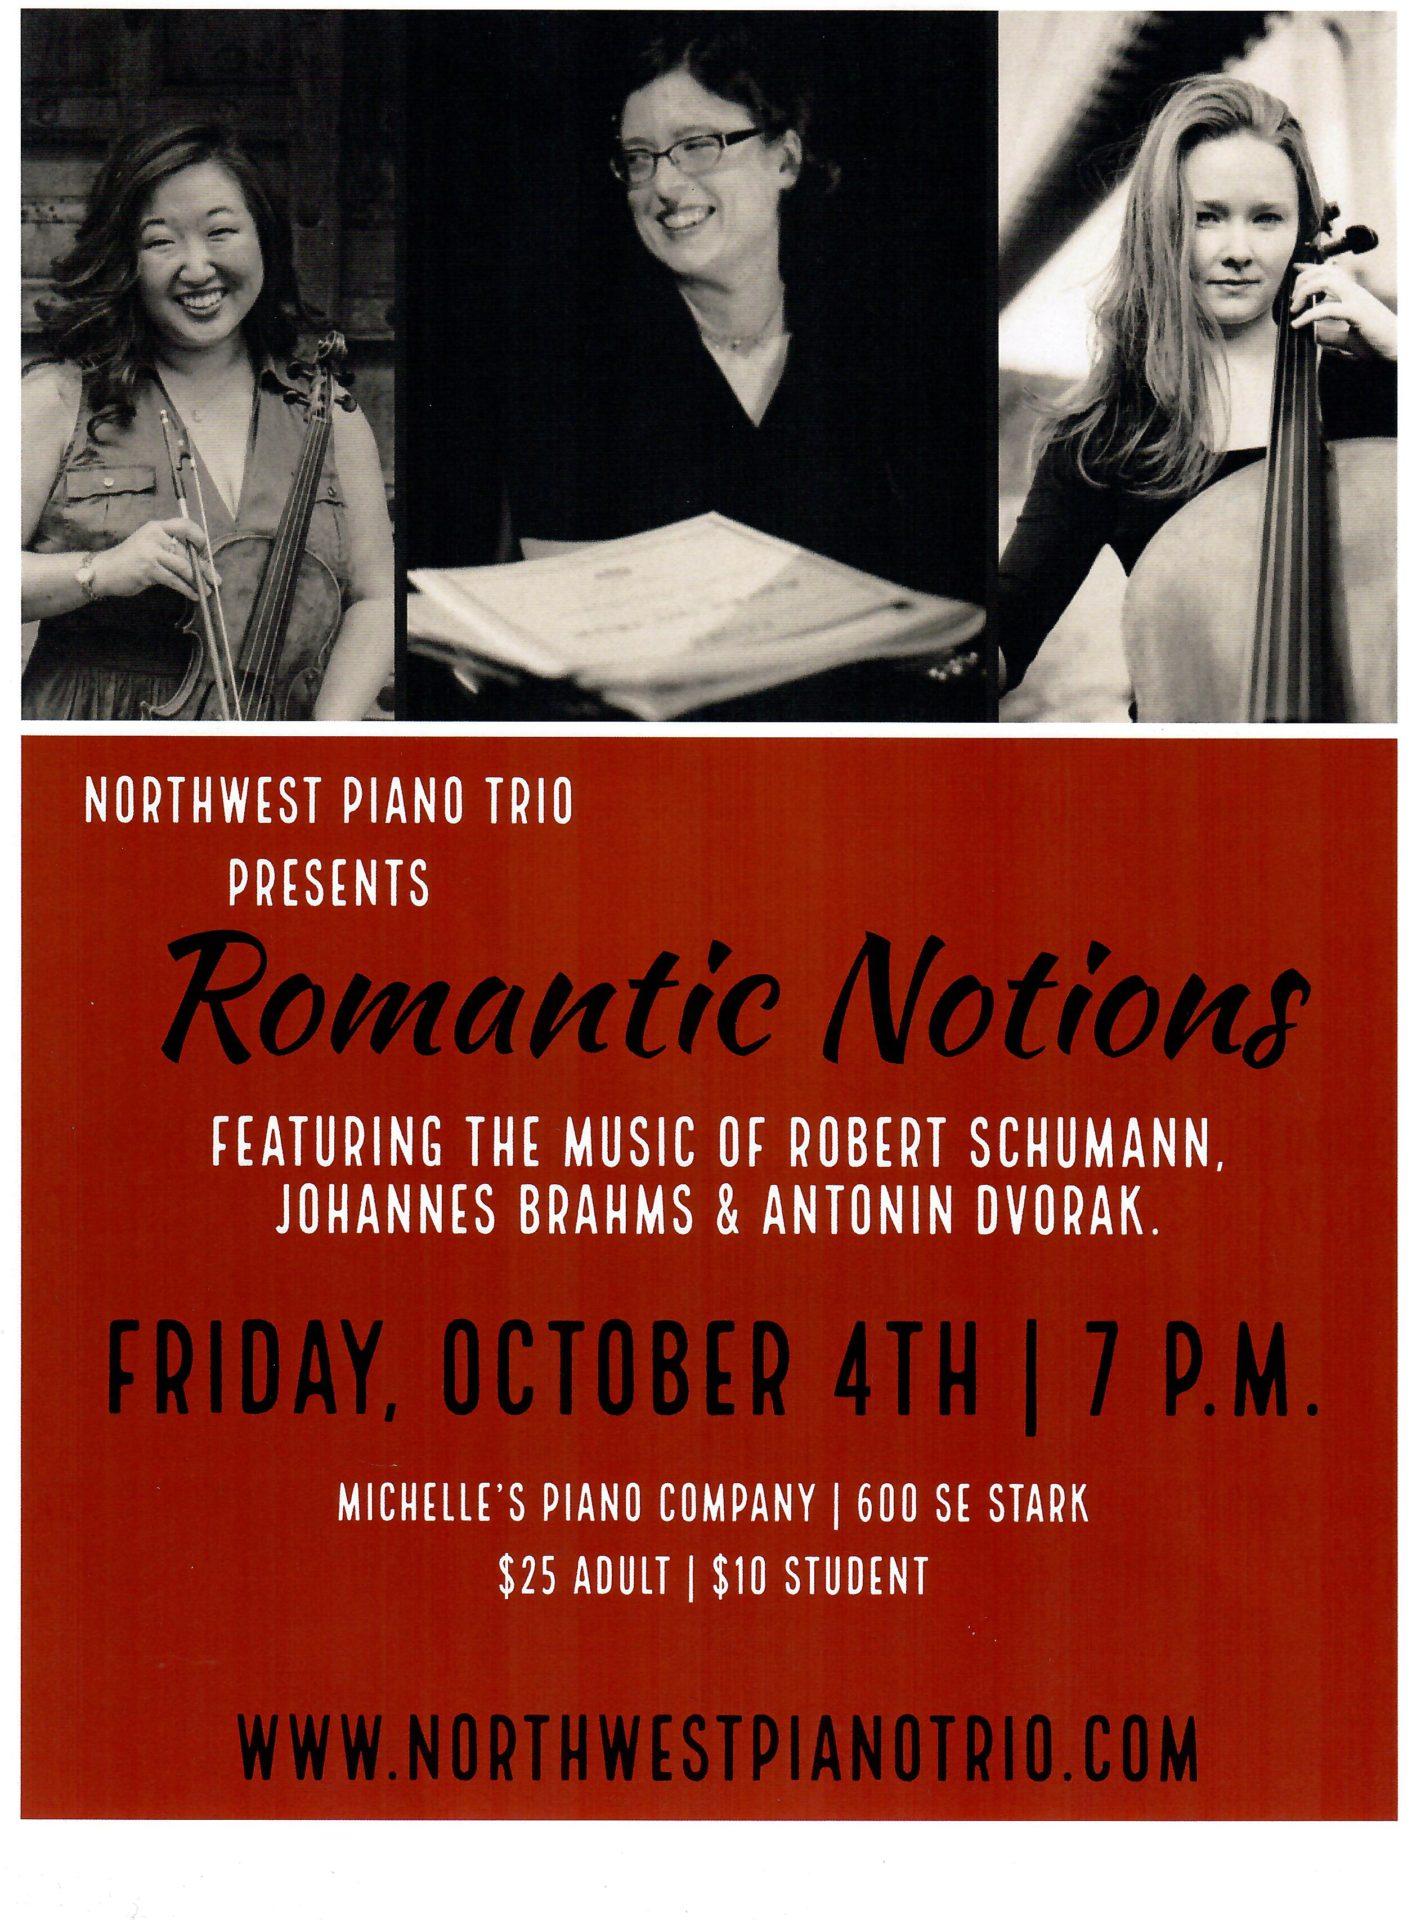 Northwest Piano Trio Presents Romantic Notes at Michelles Piano in Portland OR